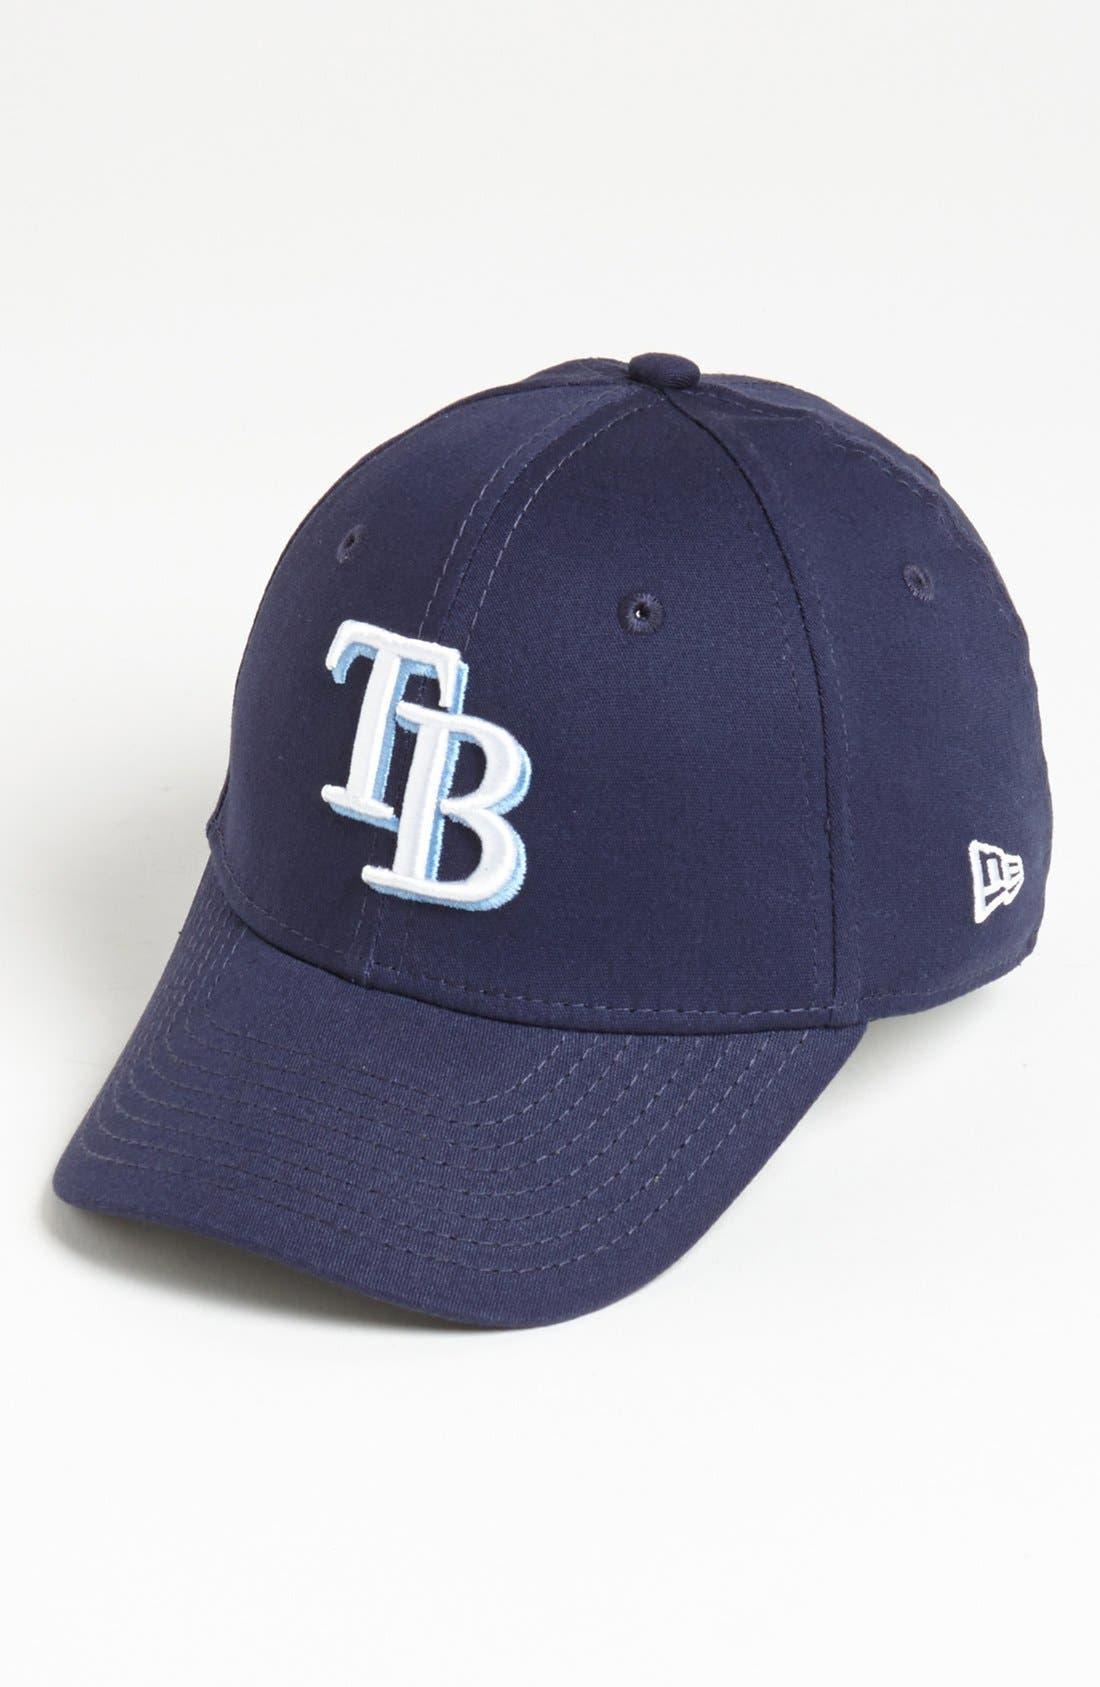 'Tampa Bay Rays - Tie Breaker' Baseball Cap,                         Main,                         color, Dark Blue